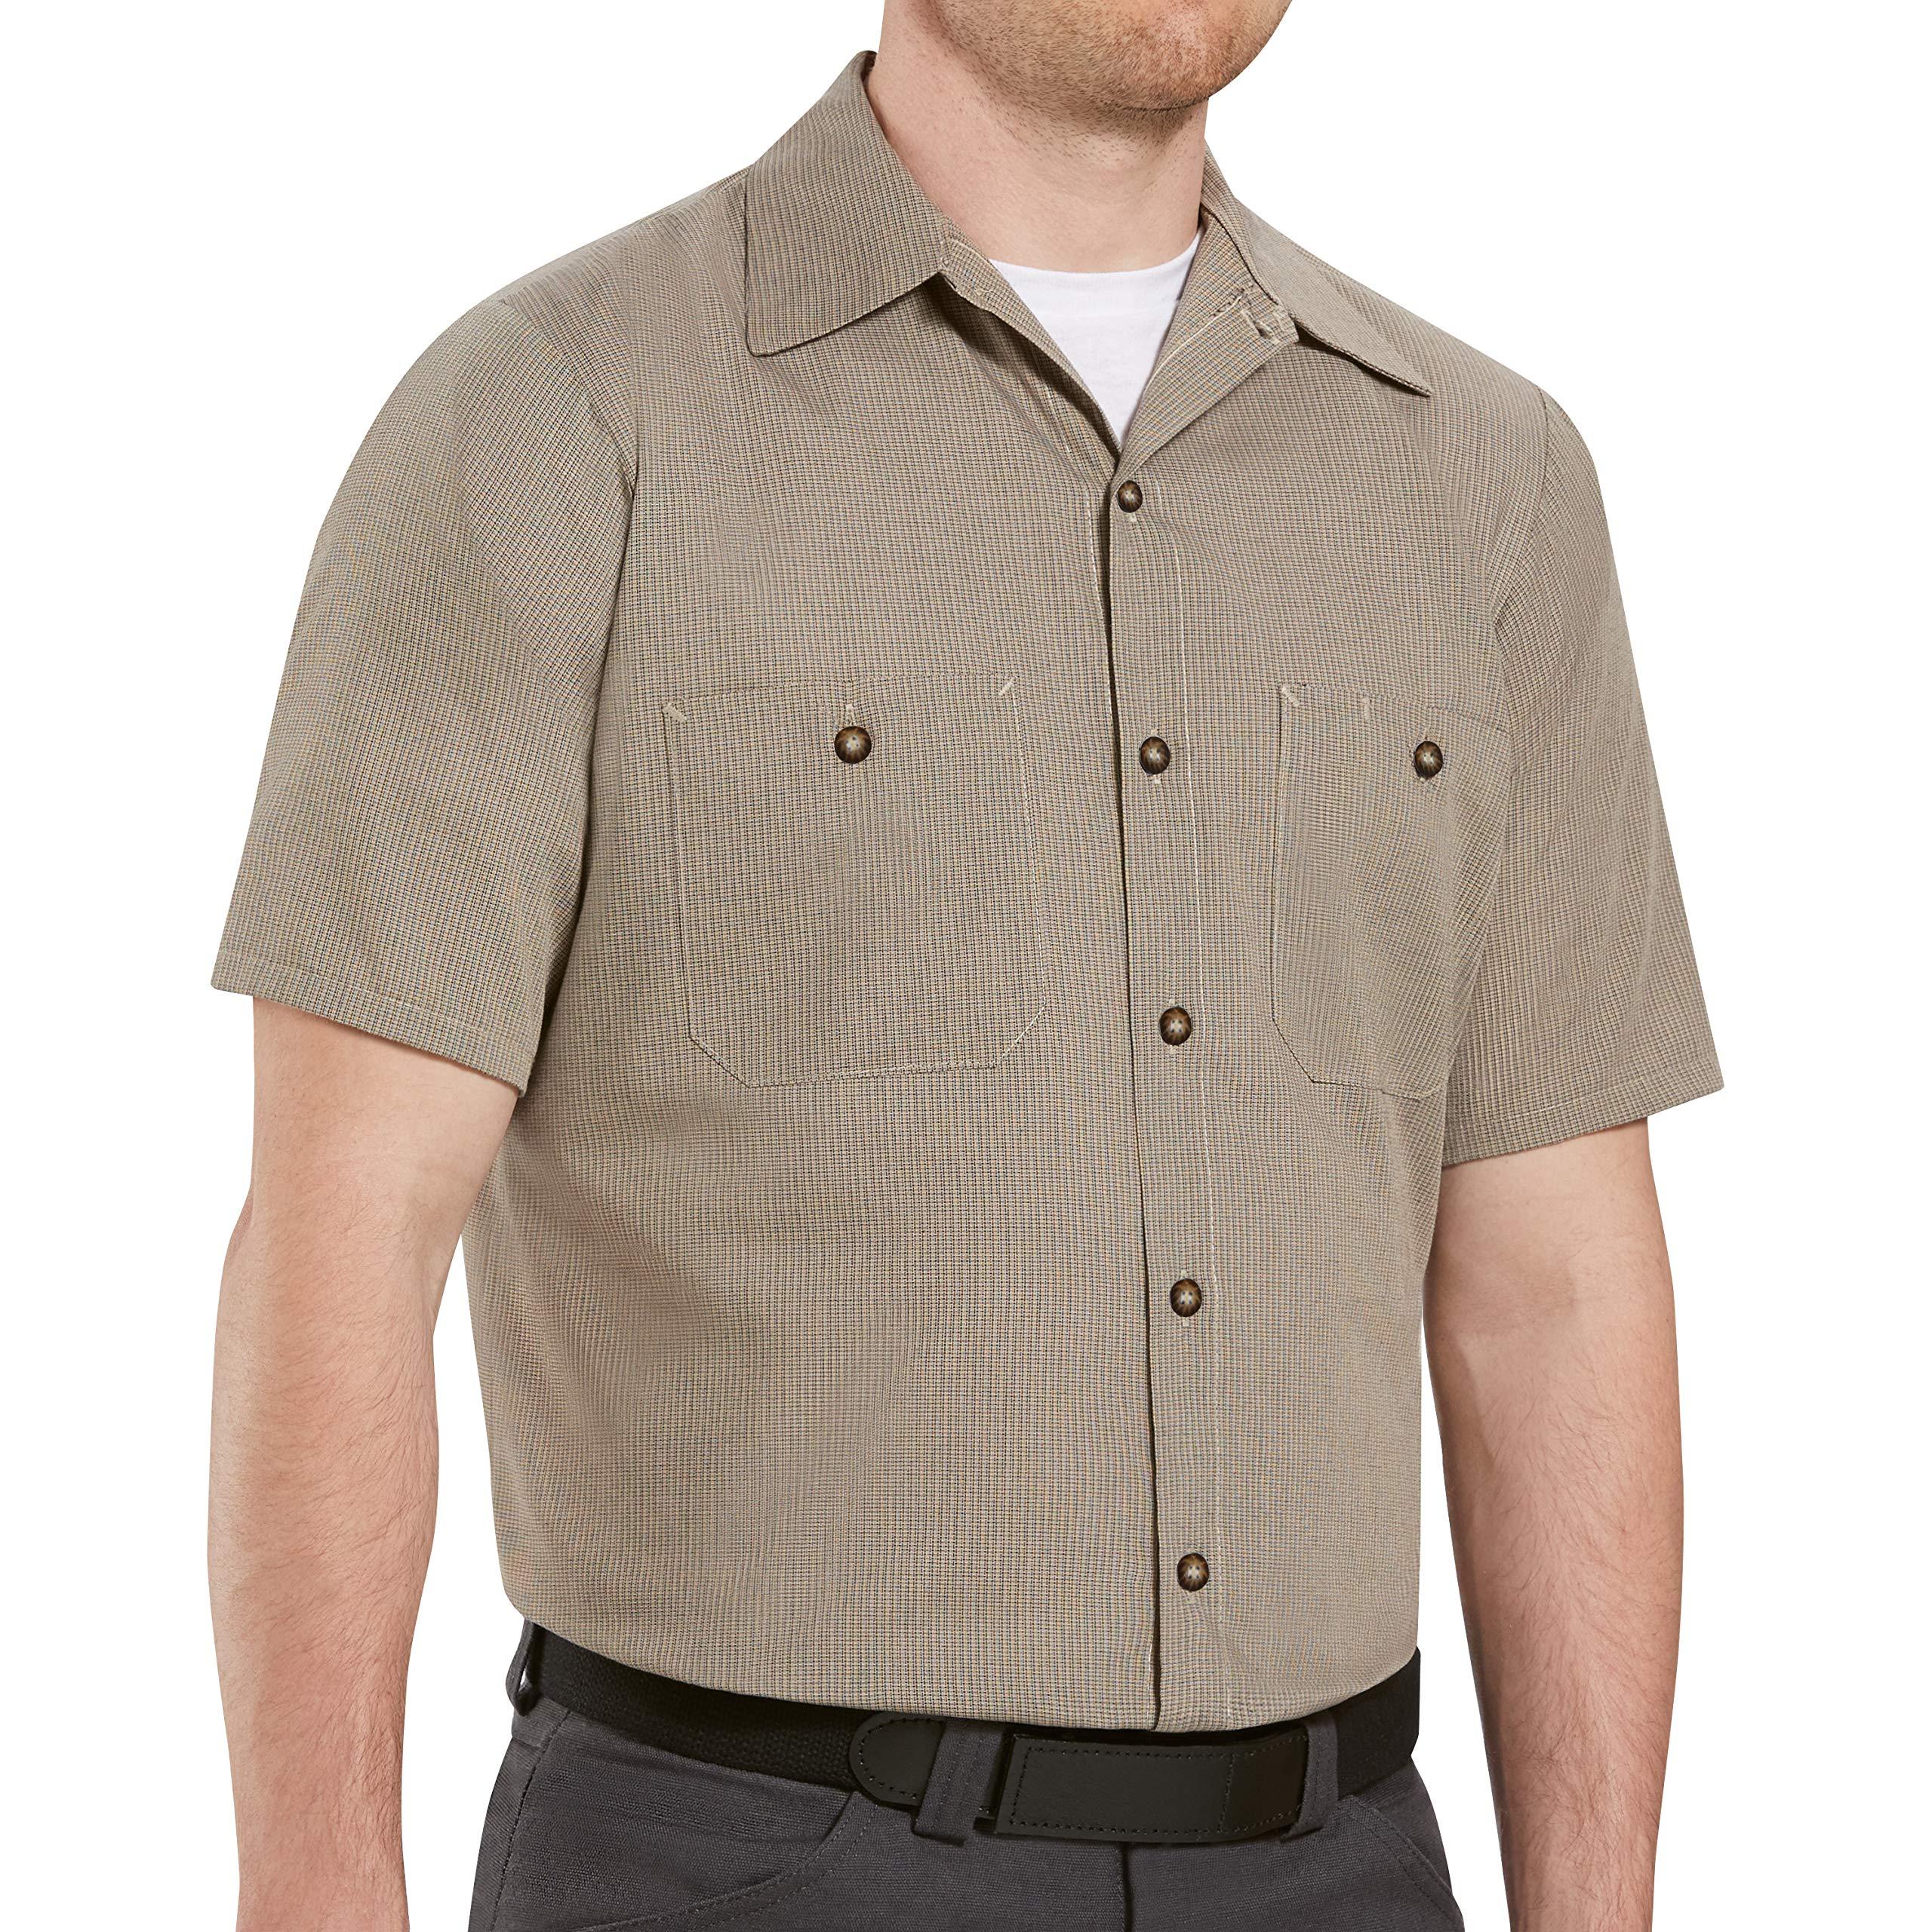 Red Kap Men's Motorsports Shirt, Short Sleeve